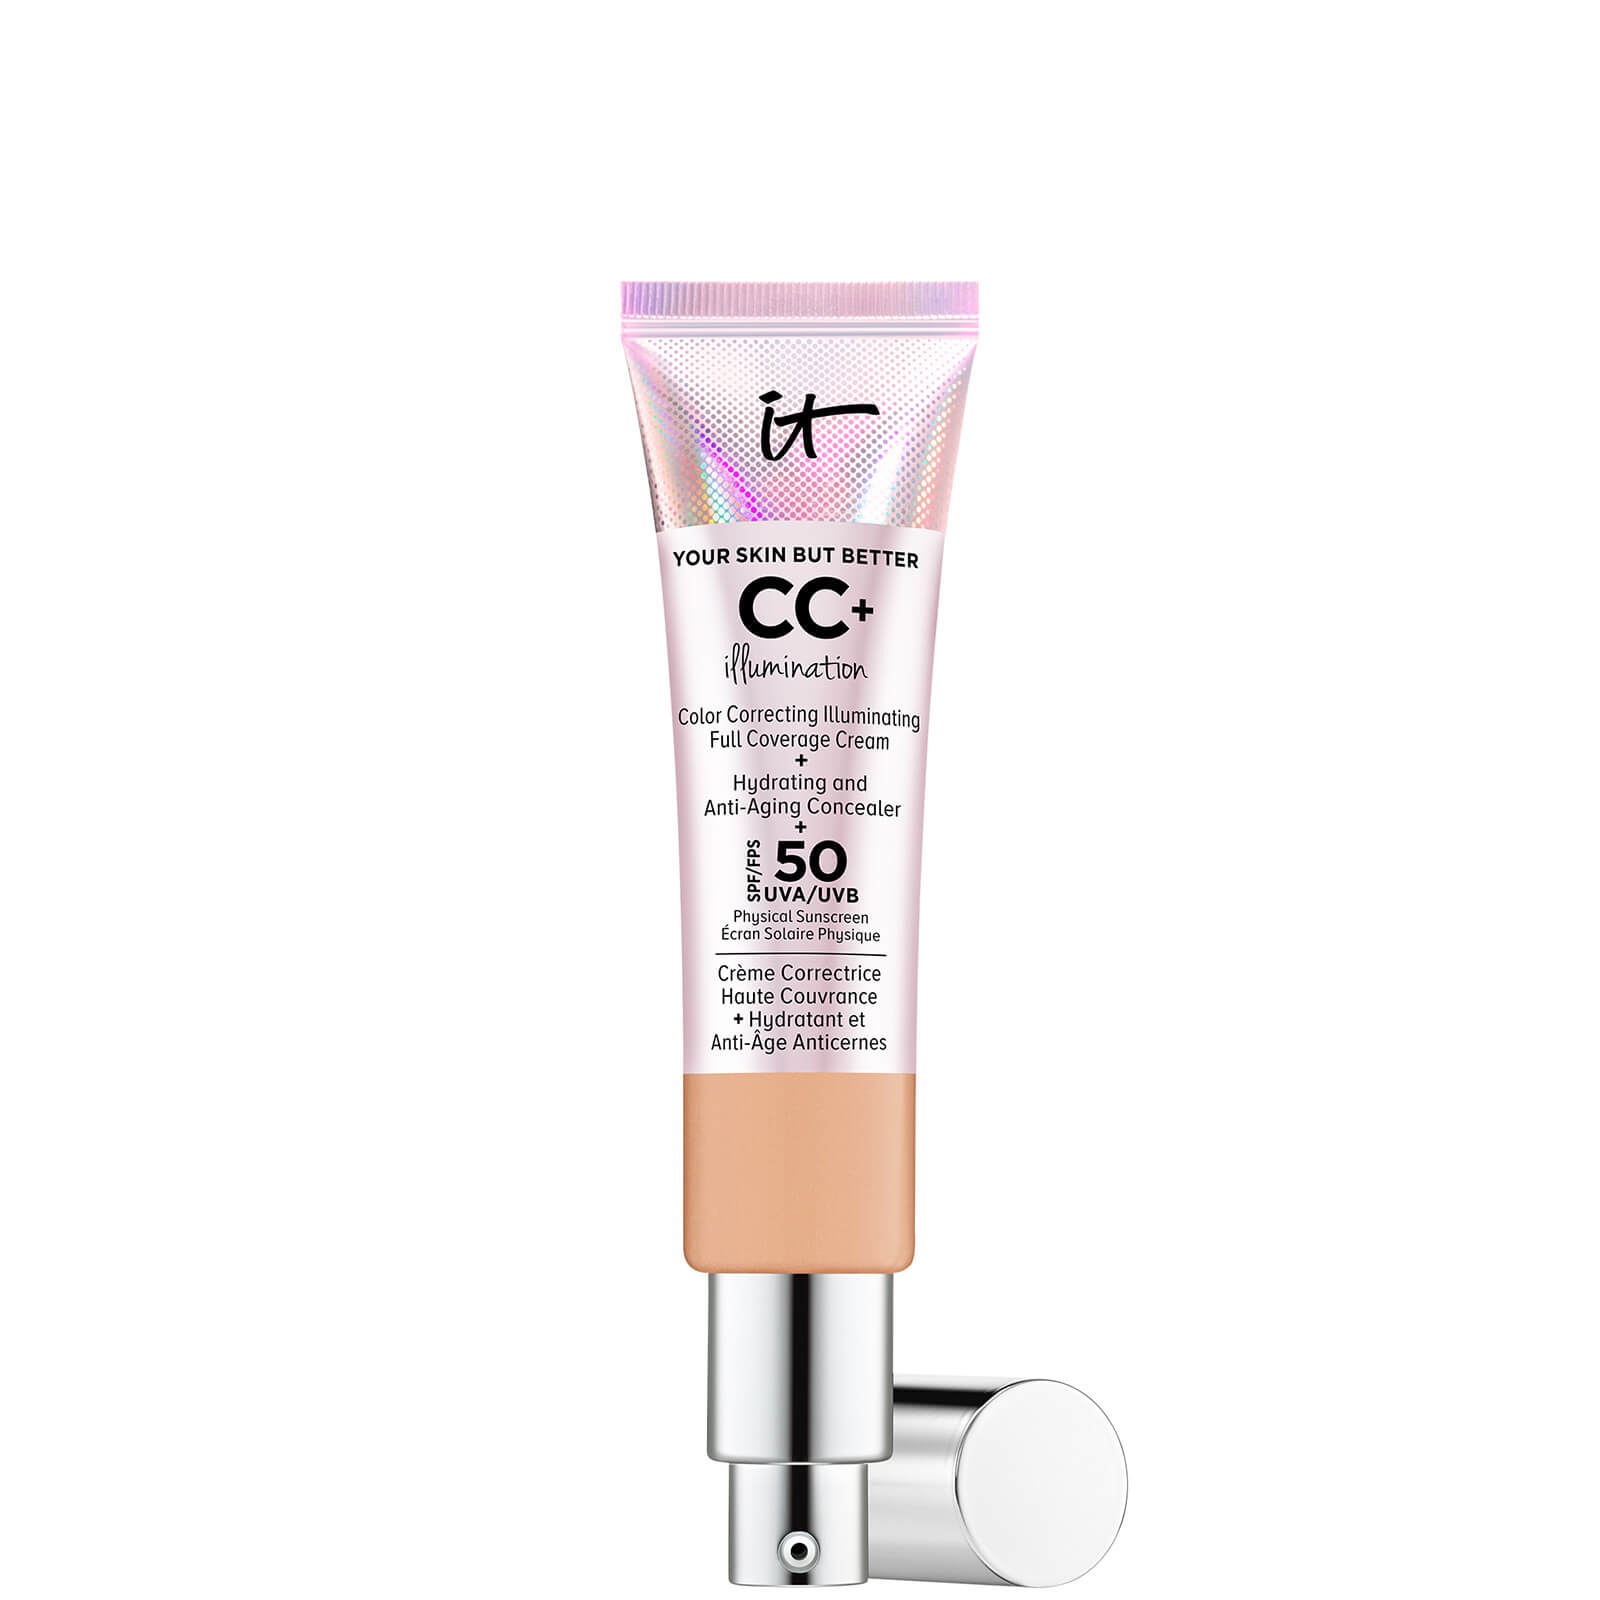 Купить IT Cosmetics Your Skin But Better CC+ Illumination SPF50 32ml (Various Shades) - Medium Tan